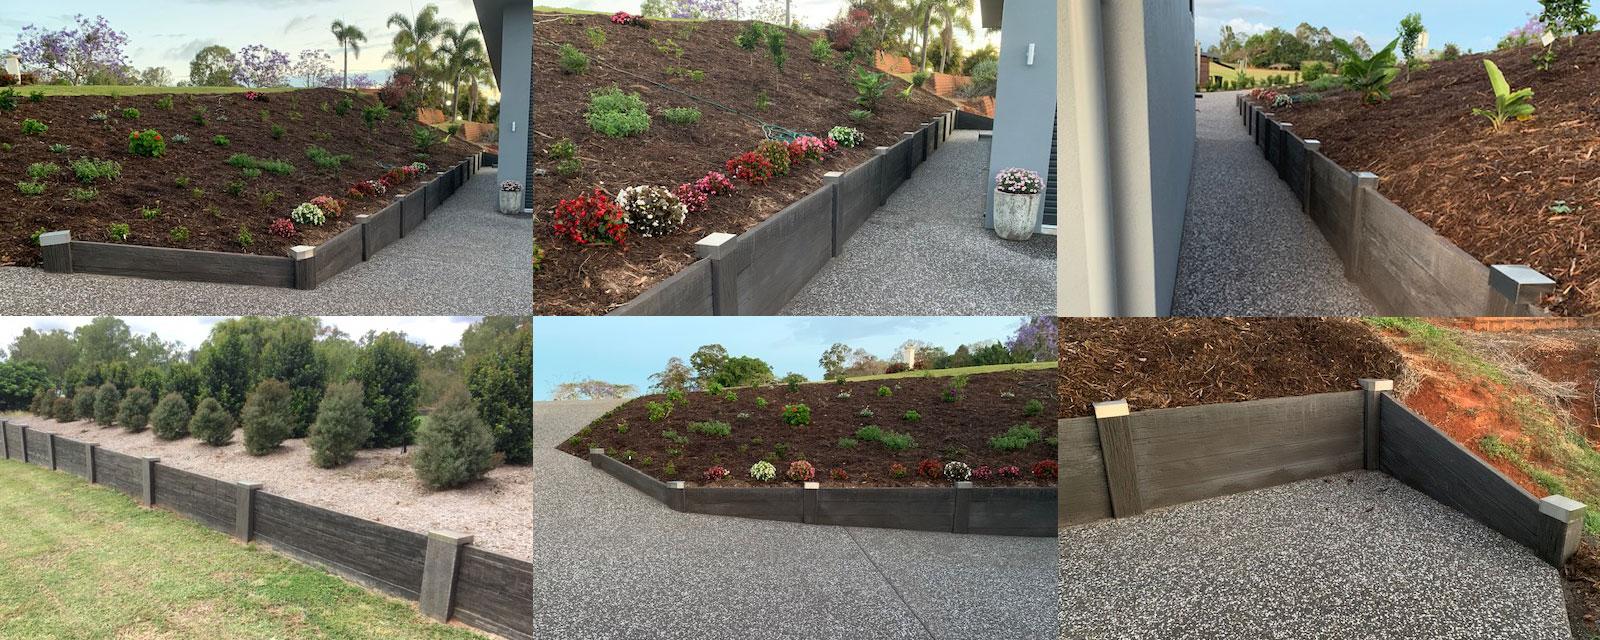 concrete-retaining-wall-home